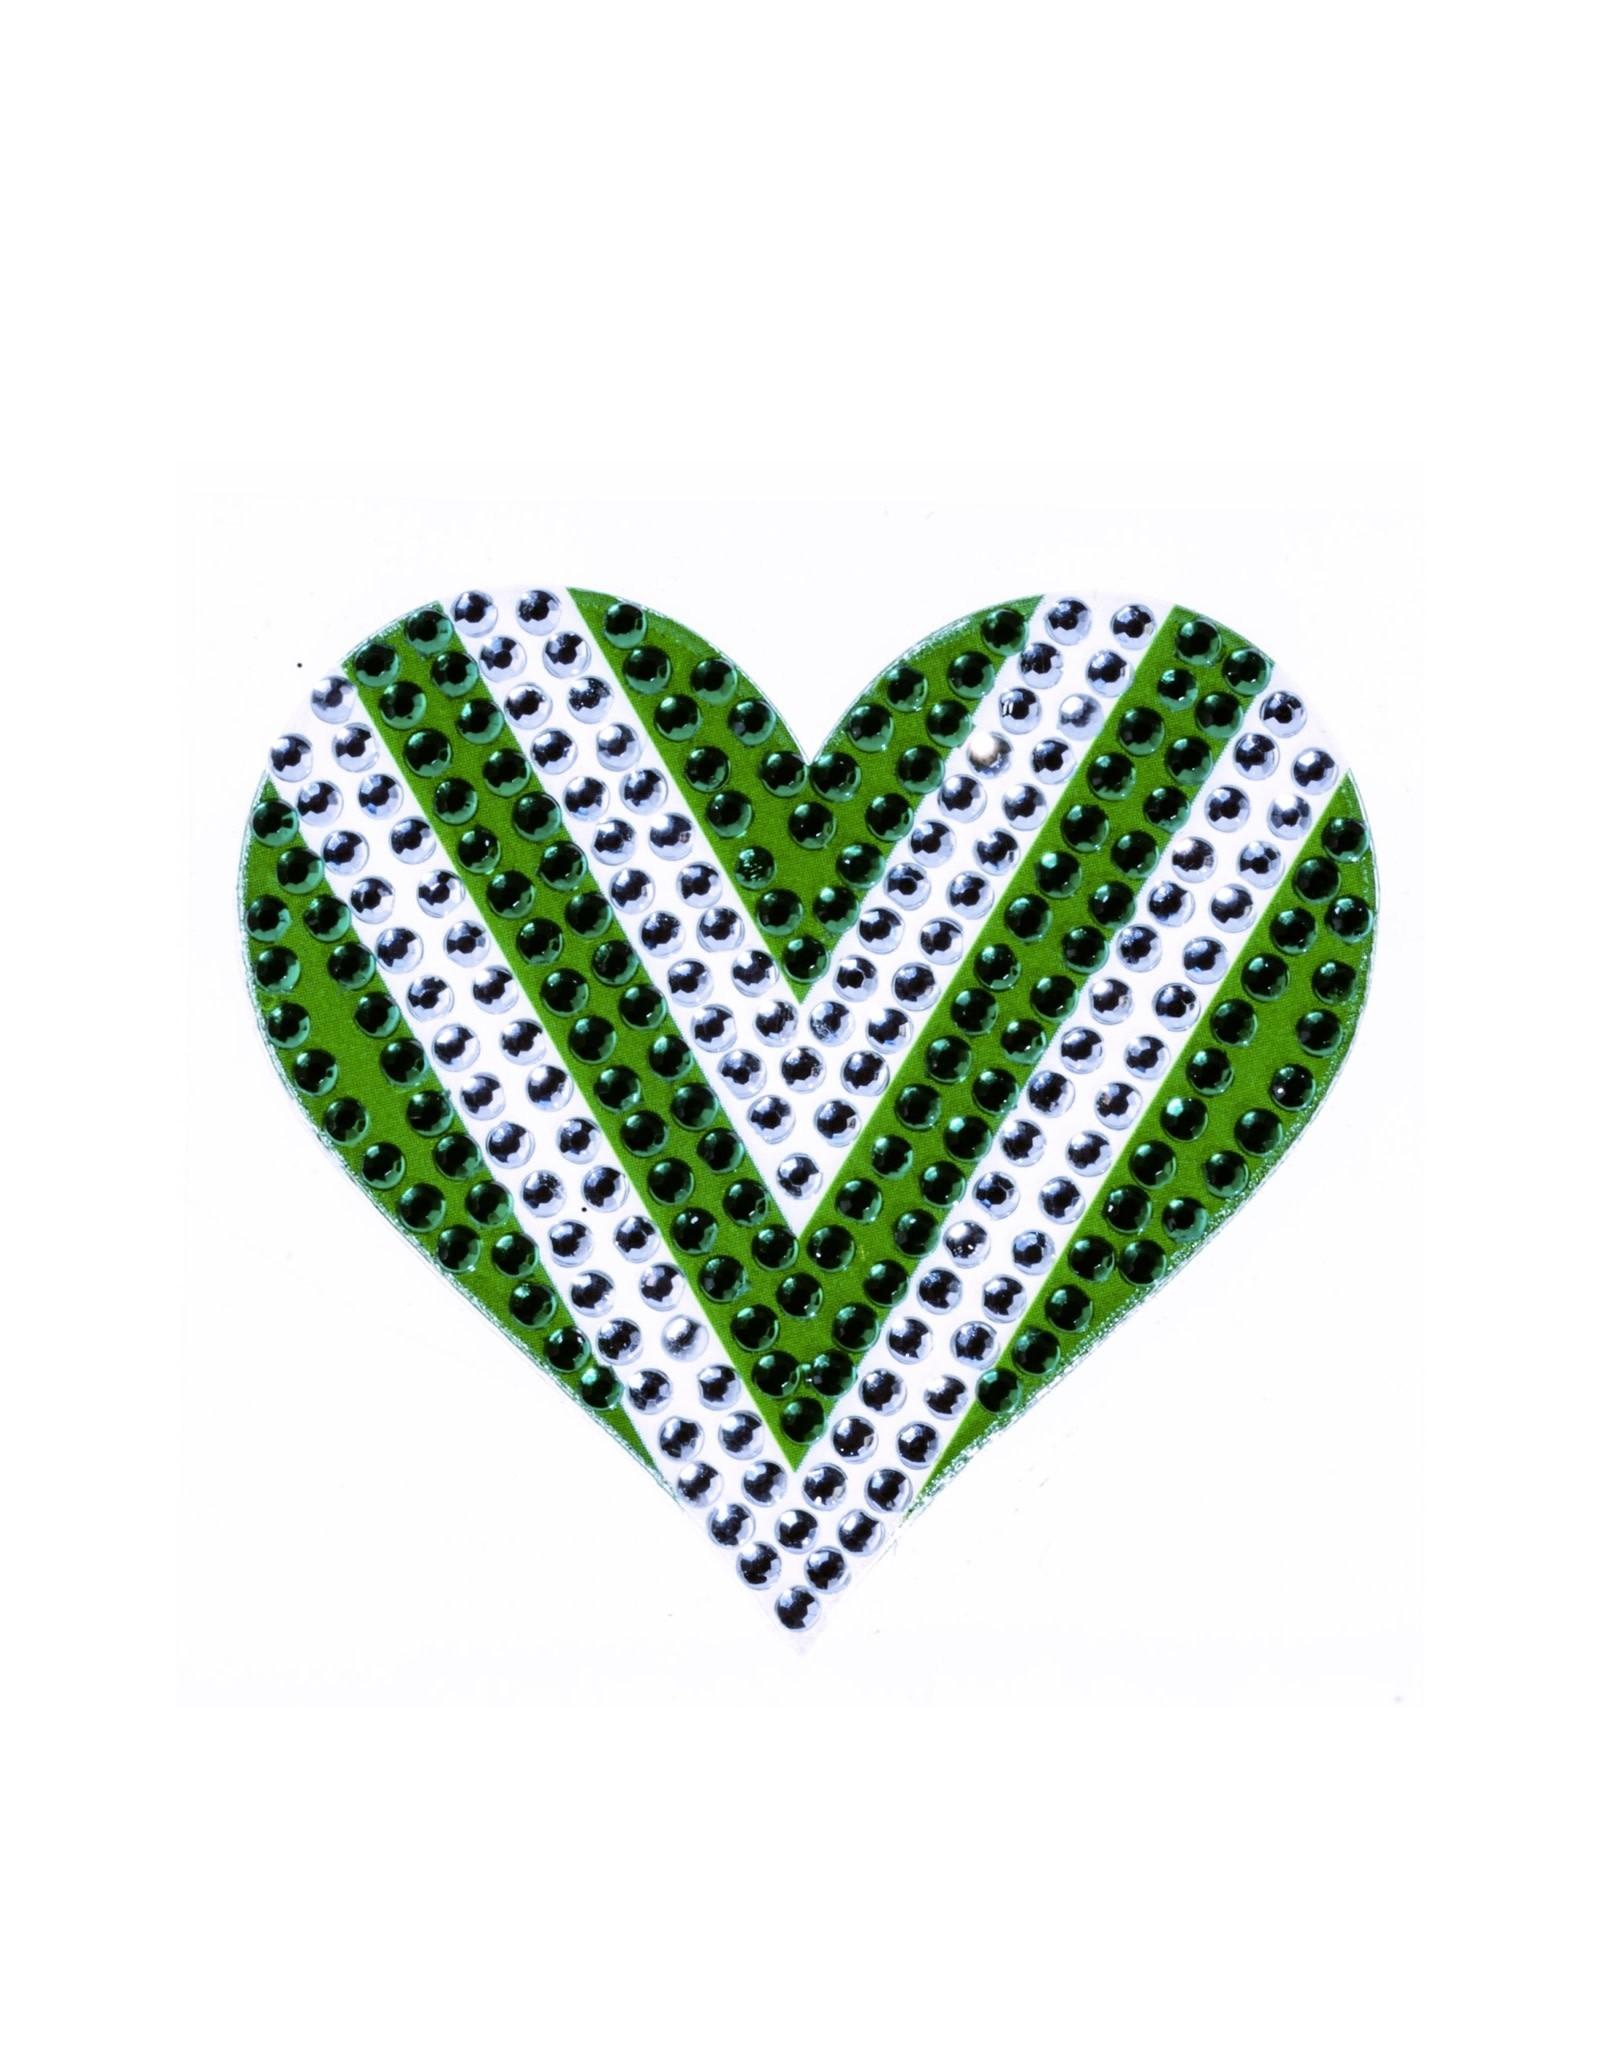 Sticker Beans Green & White Heart